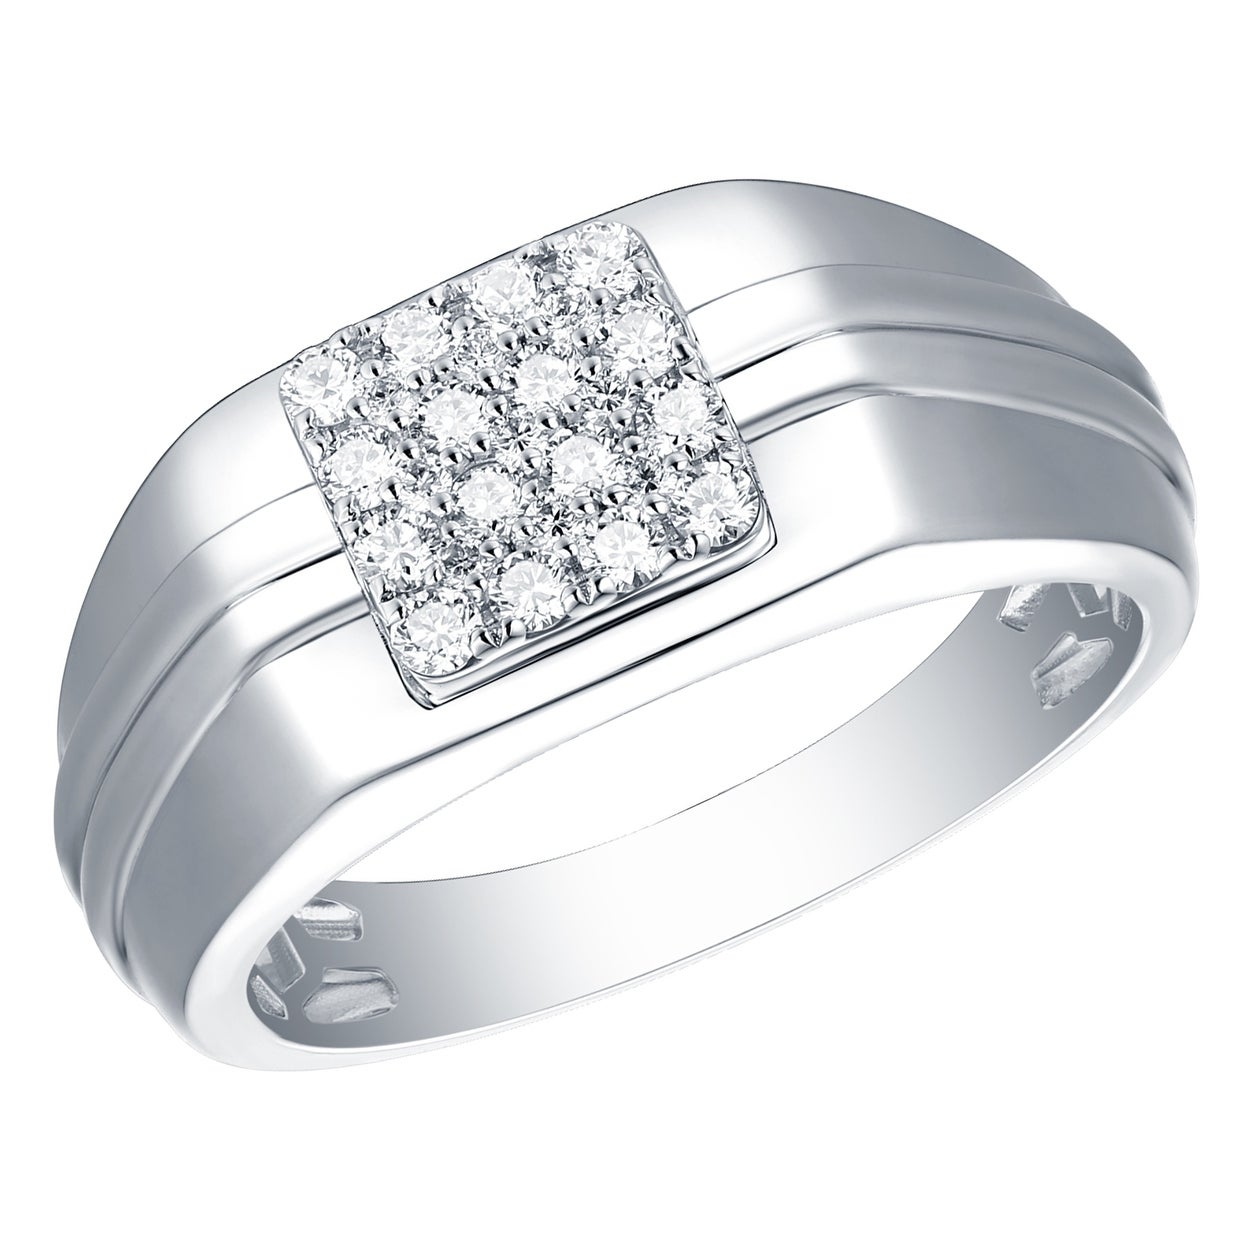 Shop Prism Jewel 0 46ct Round G H I1 Natural Diamond Men S Wedding